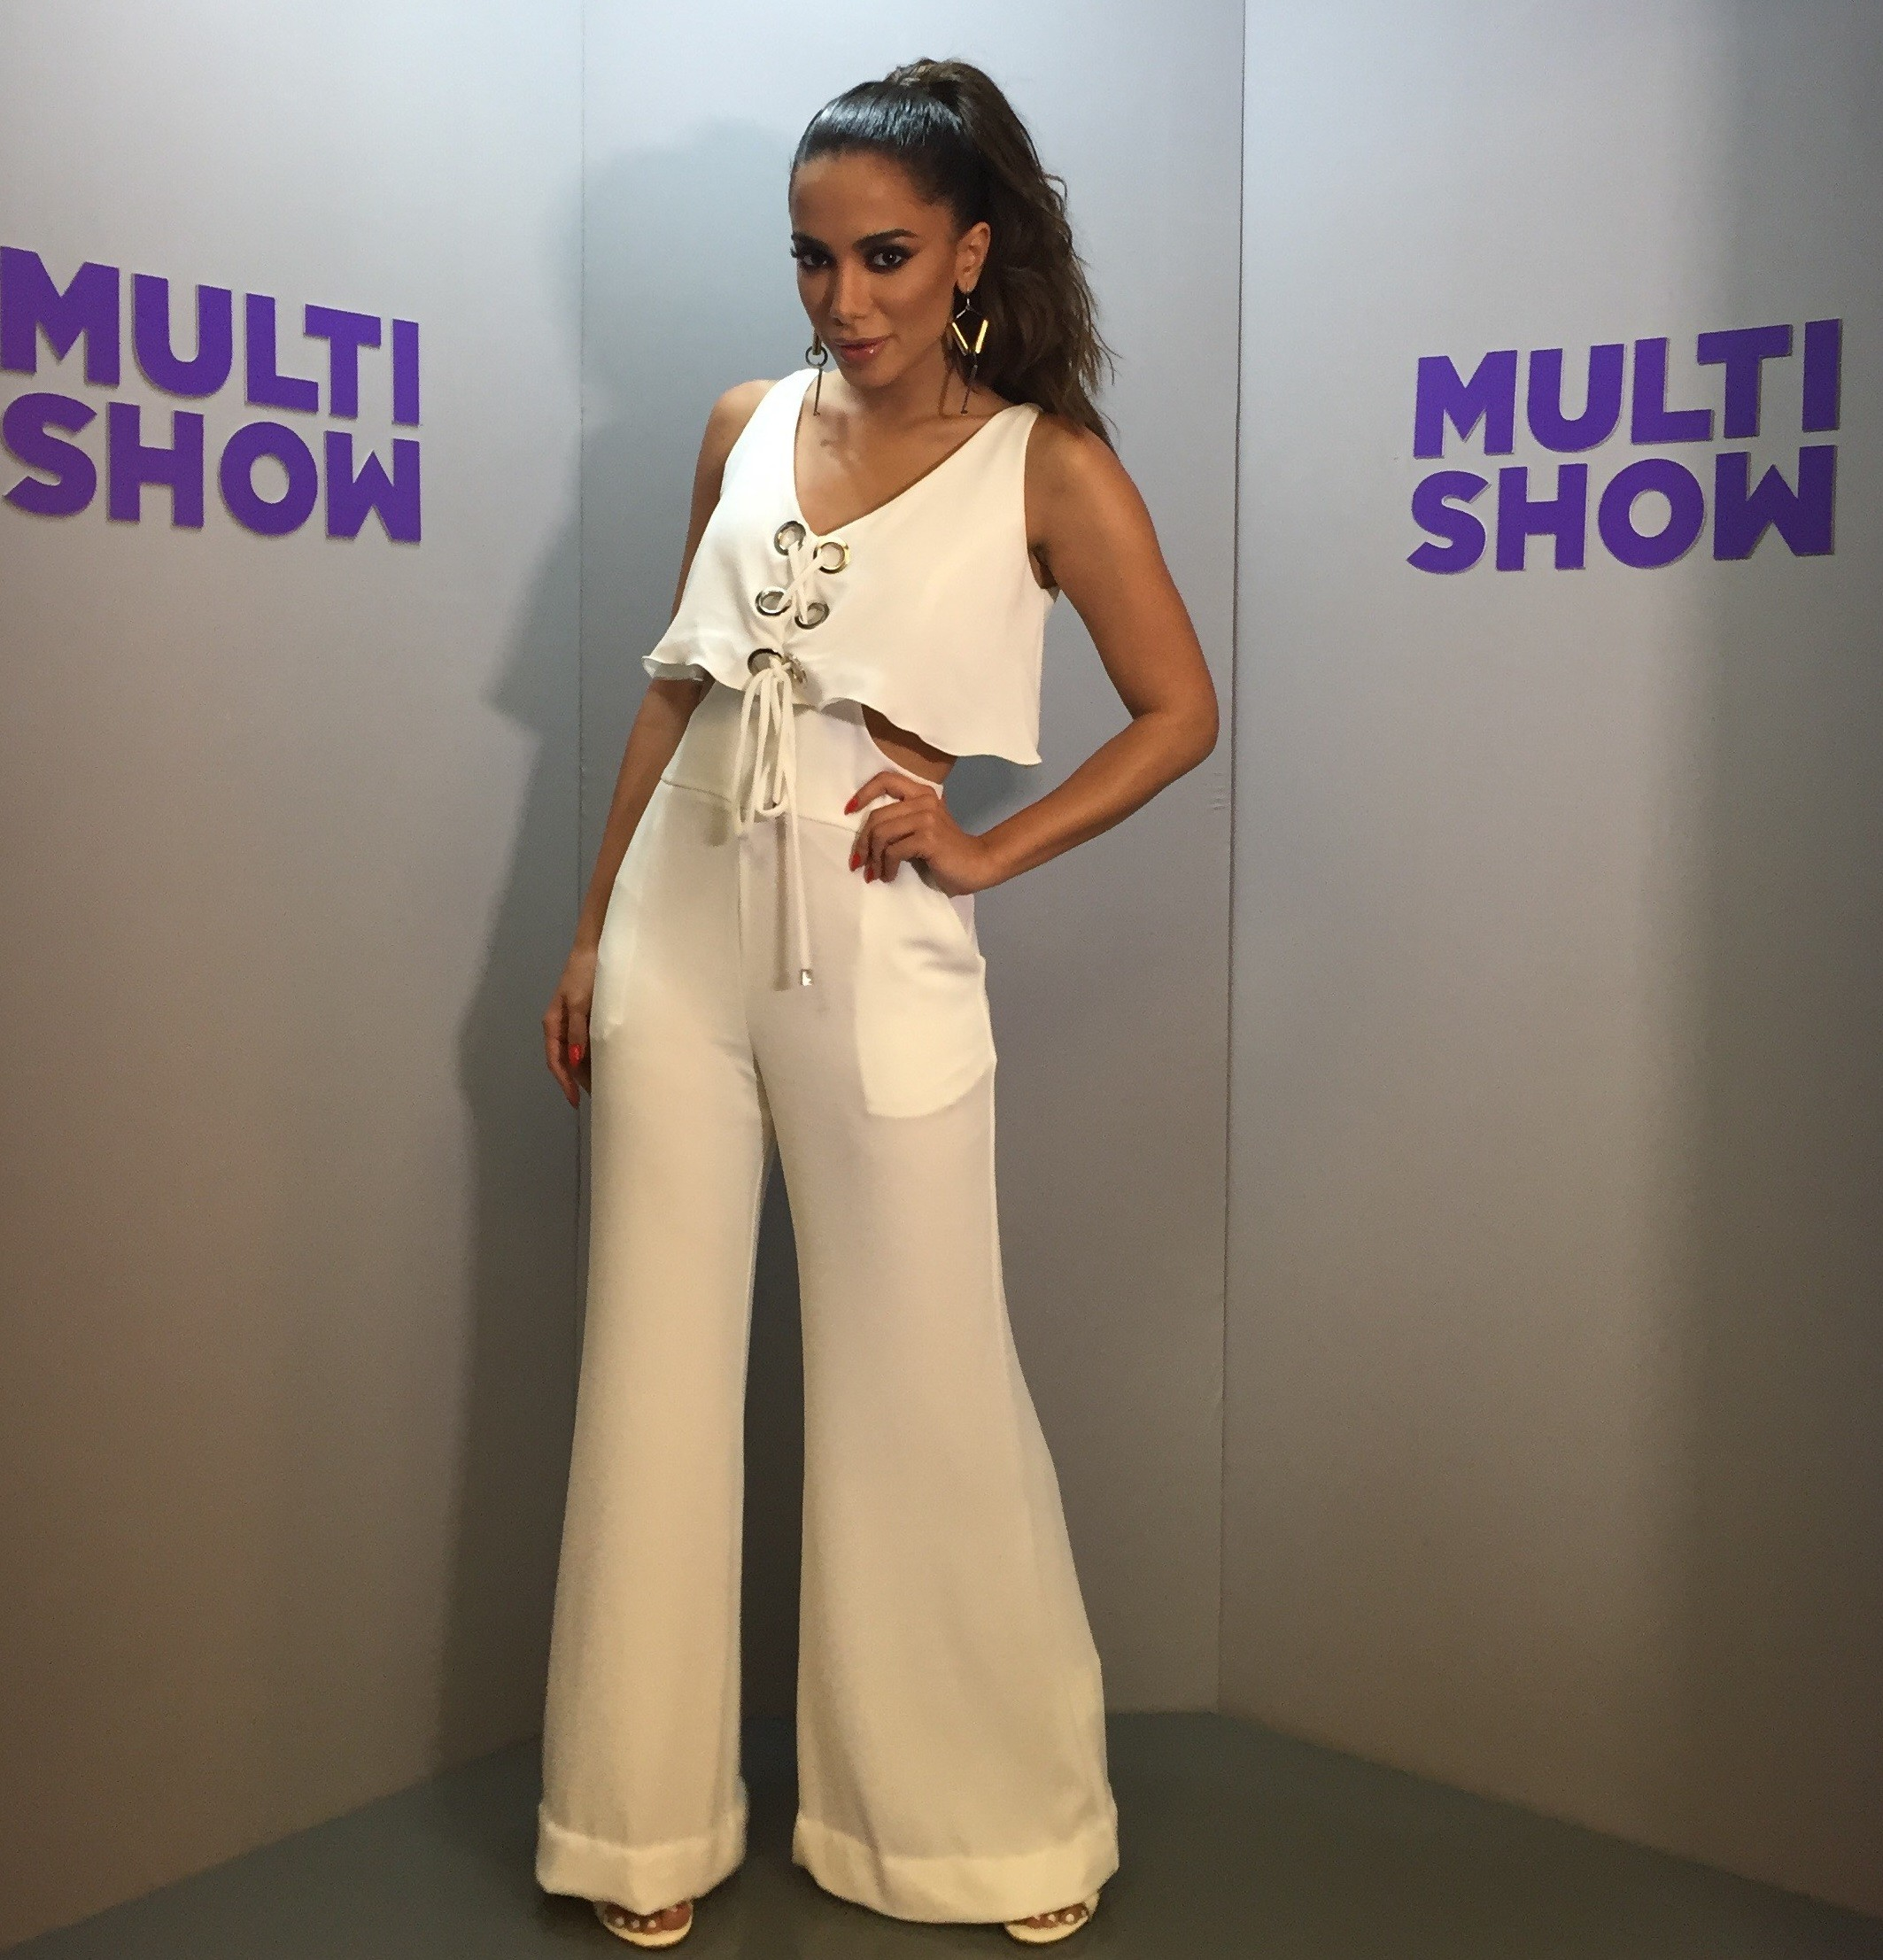 Anitta aposta em look todo branco para o Msica Boa Ao Vivo desta tera-feira (18) (Foto: Daniel Seda/Multishow)